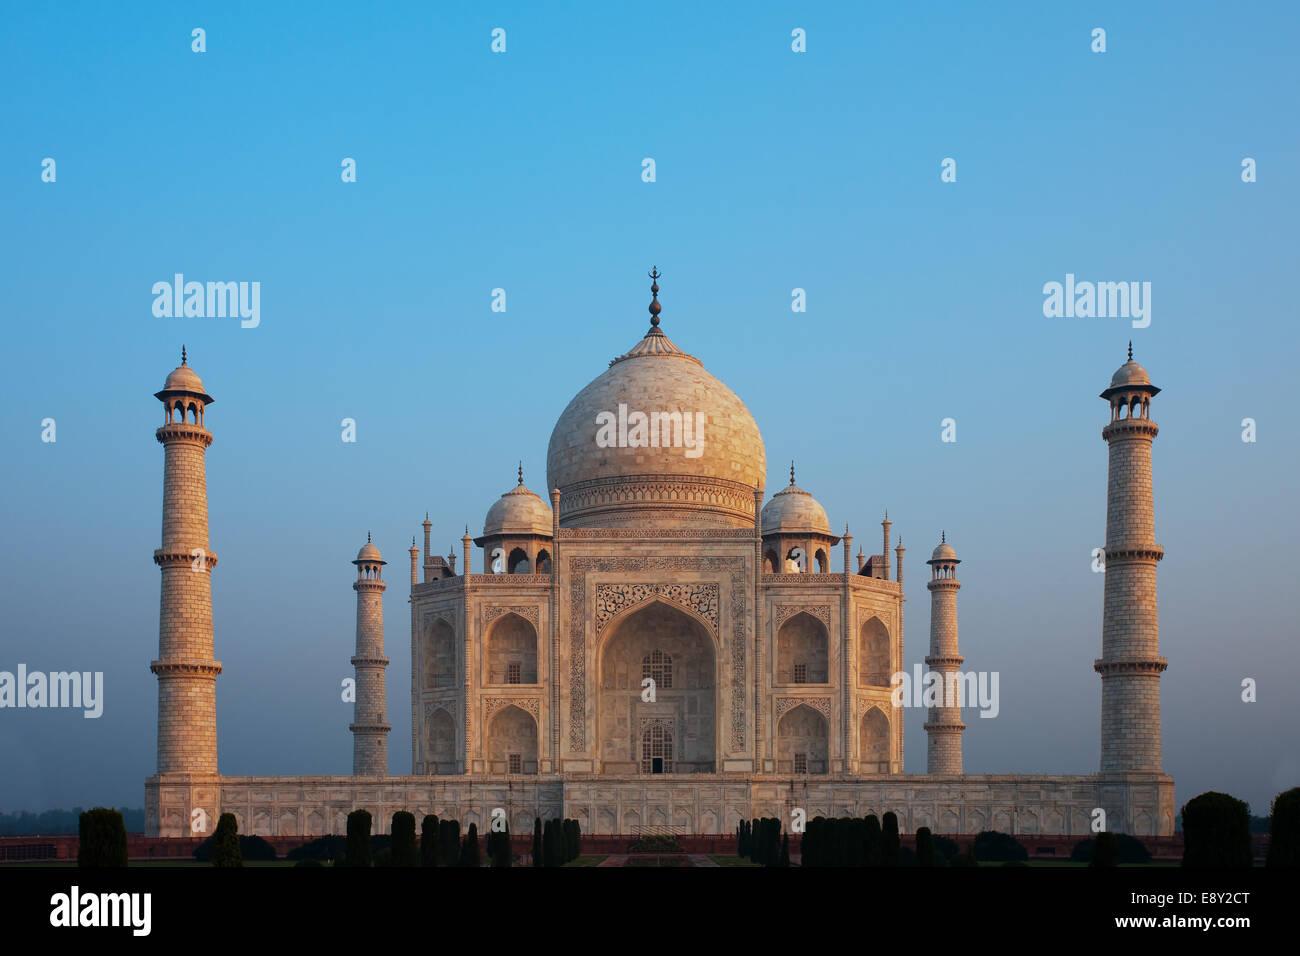 Centered Taj Mahal Empty at Sunrise - Stock Image